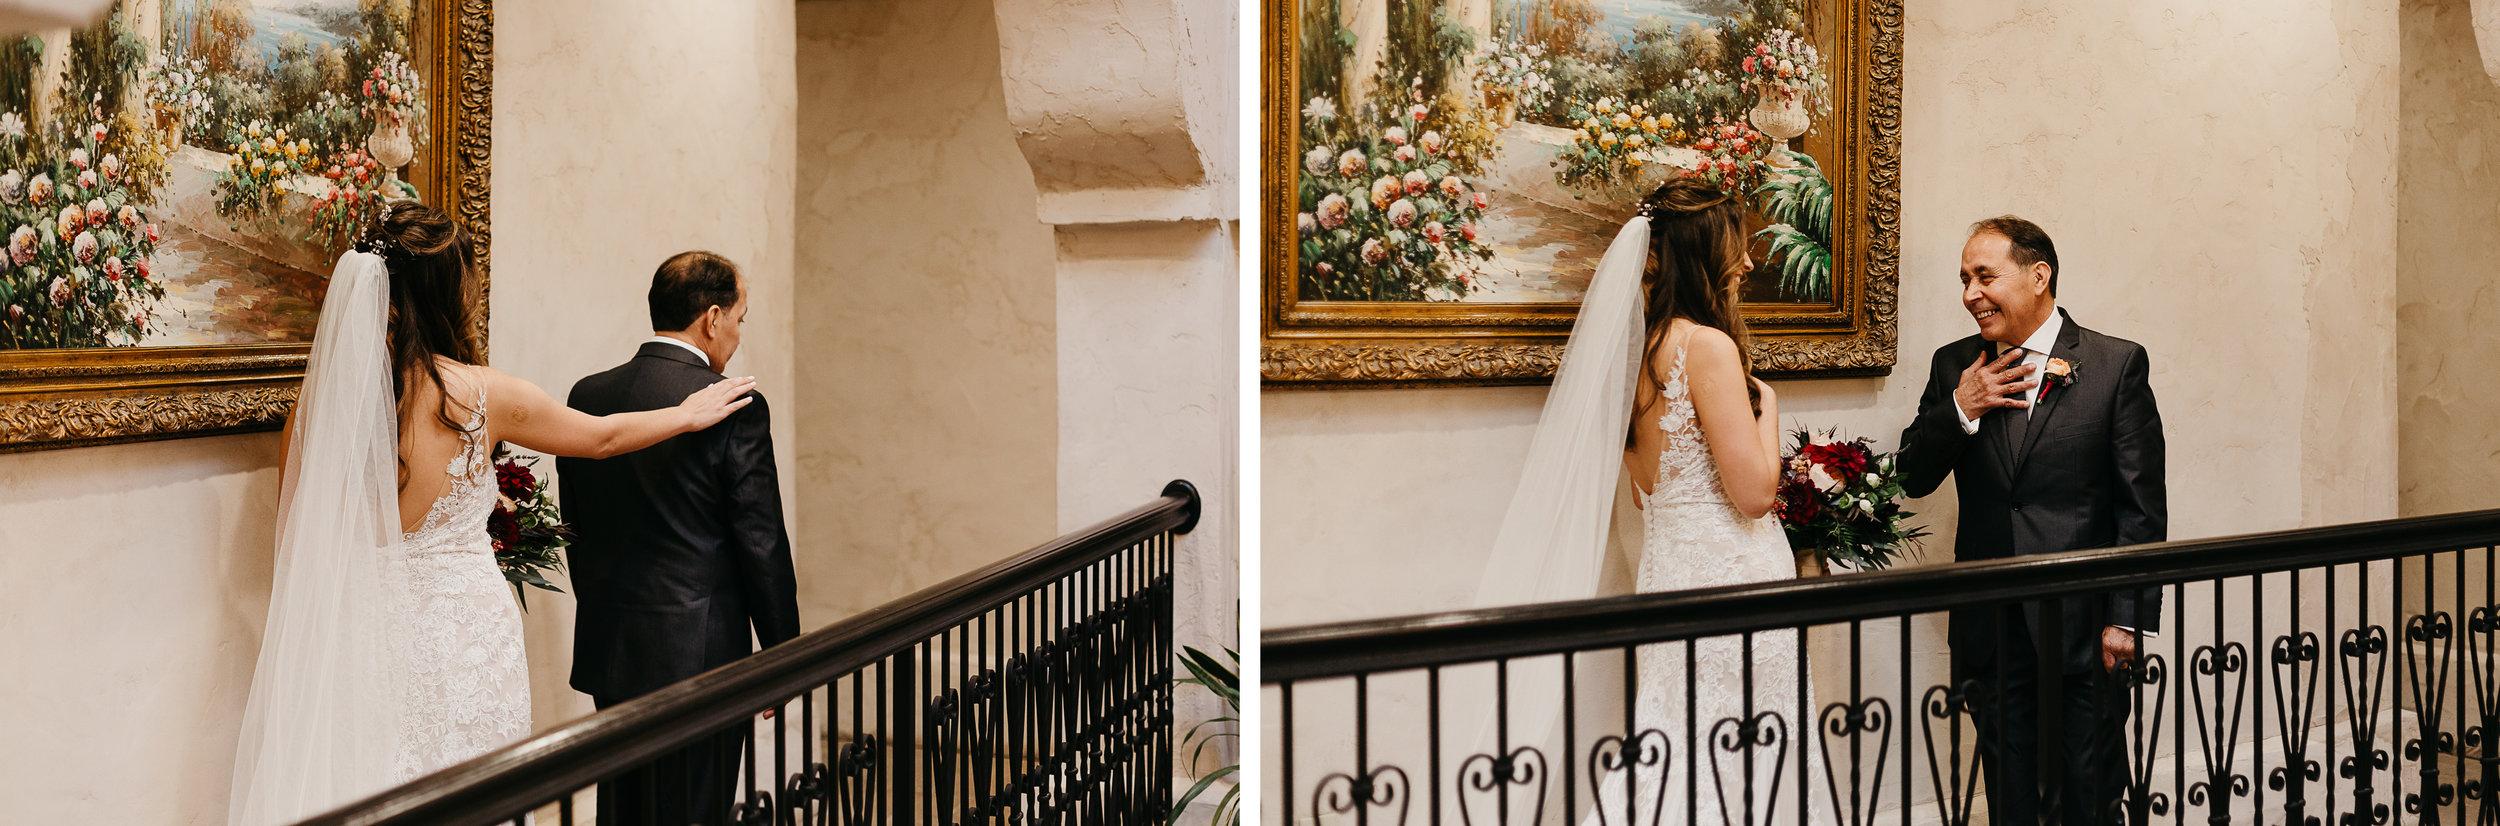 austin texas wedding photogapher elopement photographer villa antonia austin 14.jpg